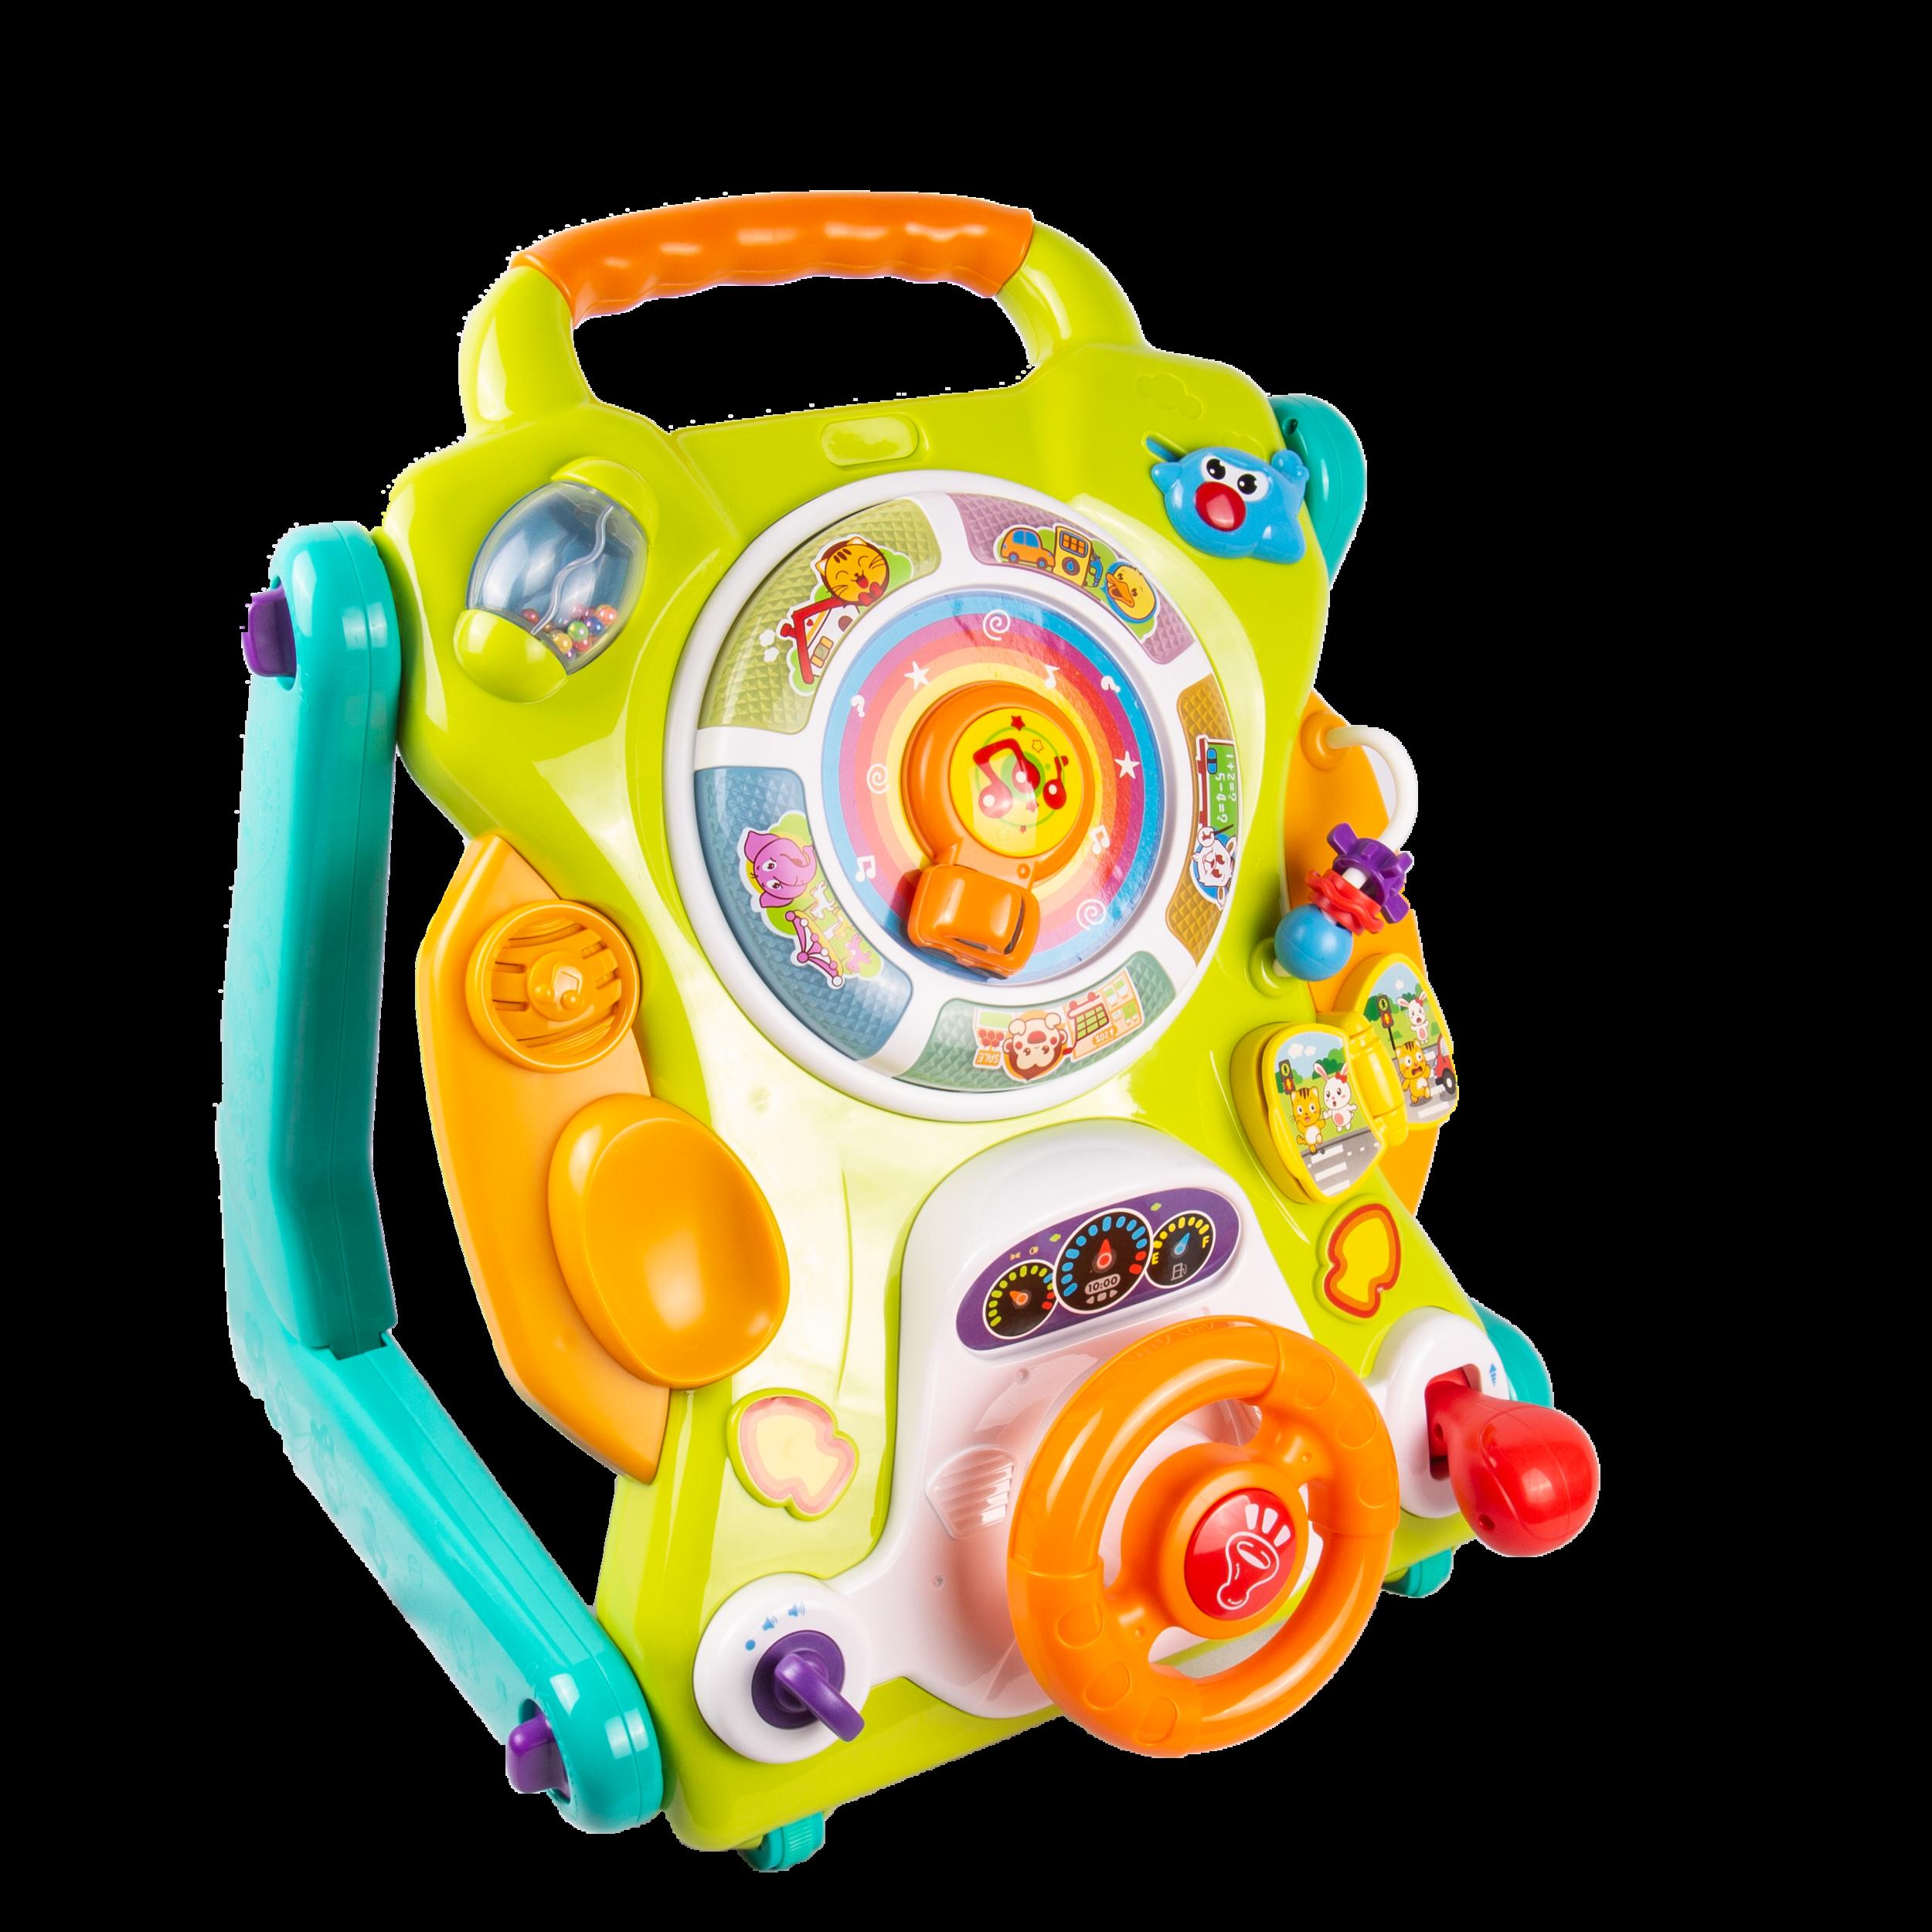 Andador y Mesa de actividades convertibles para bebes - Código: 2107